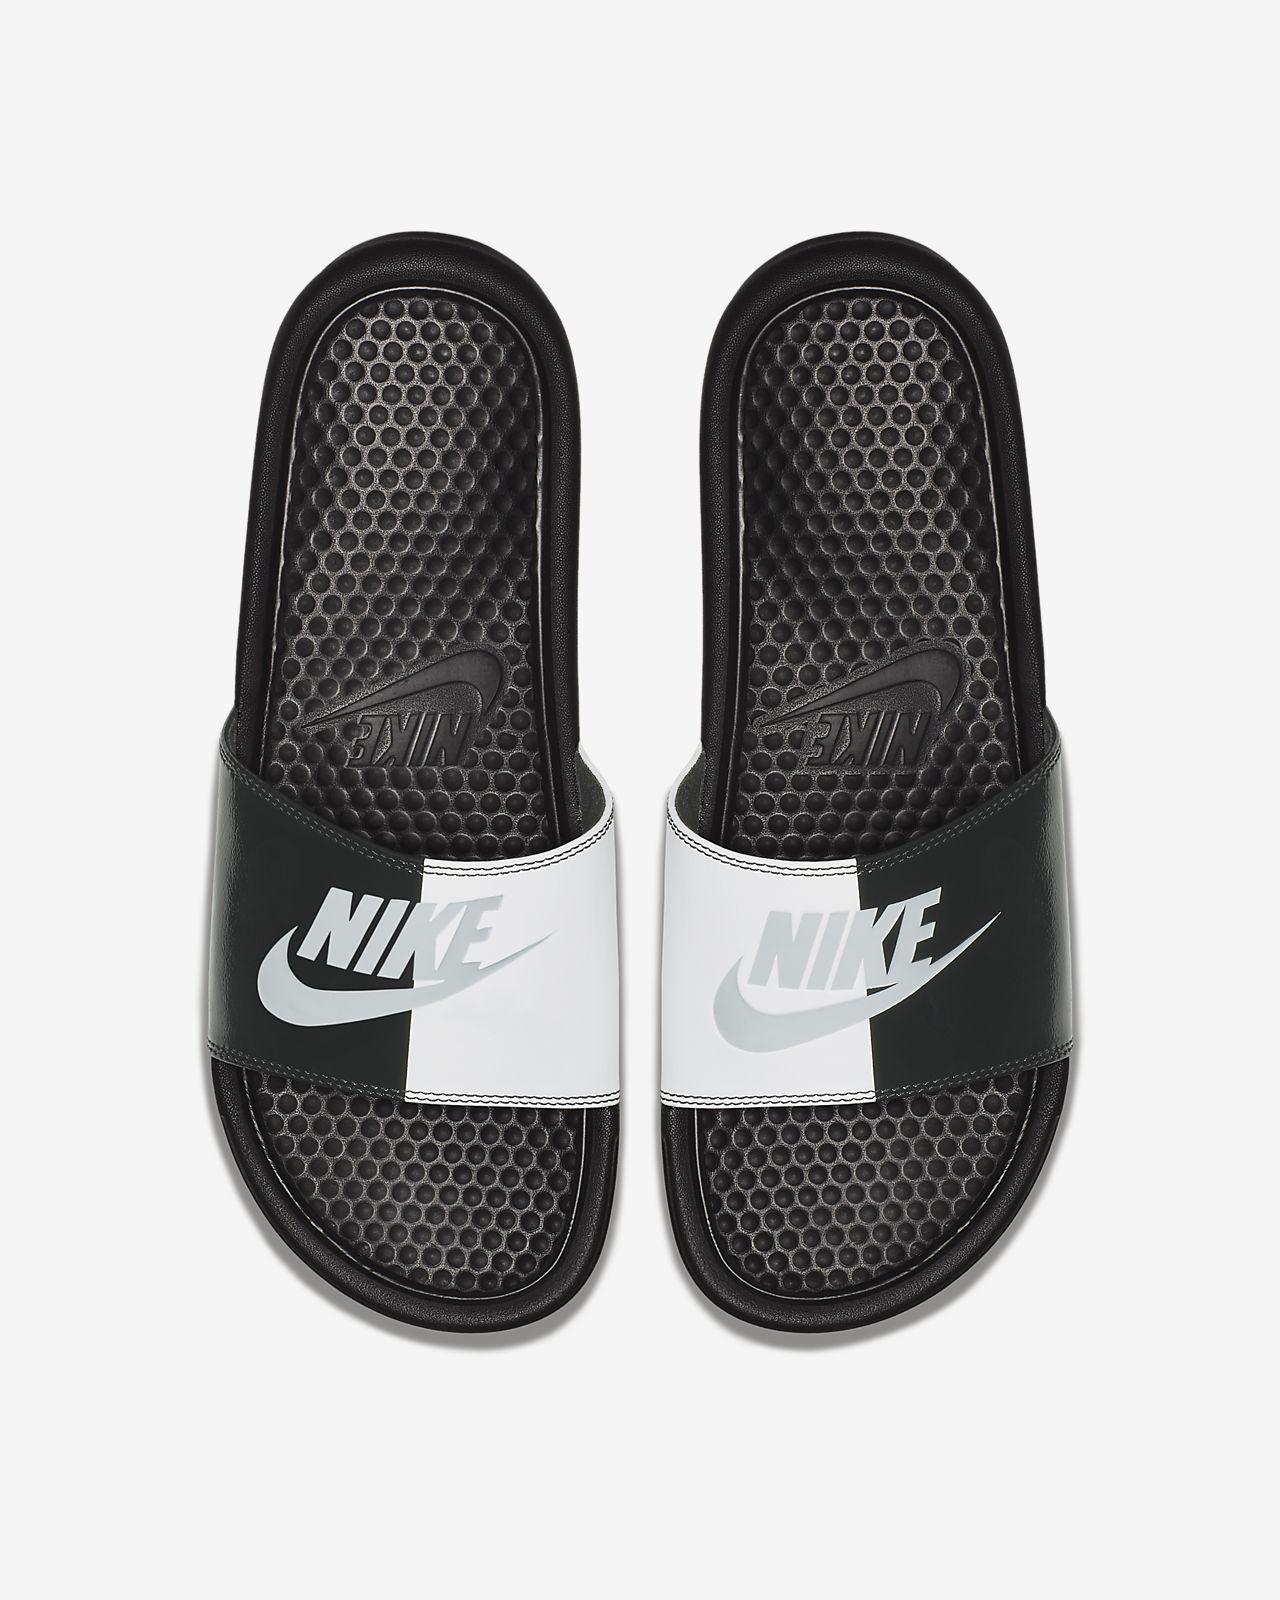 Benassi Nike Nike Benassi Claquette Ca Claquette Ca Nike Claquette Claquette Nike Benassi Ca t1AEa